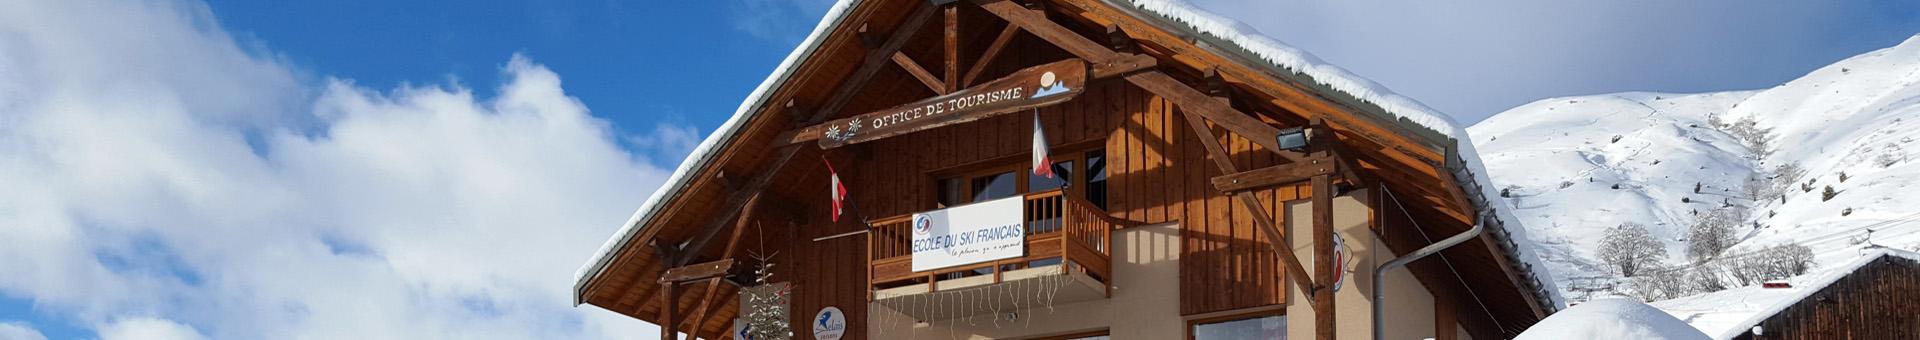 Contact Saint Jean d'Arves Visitor Centre